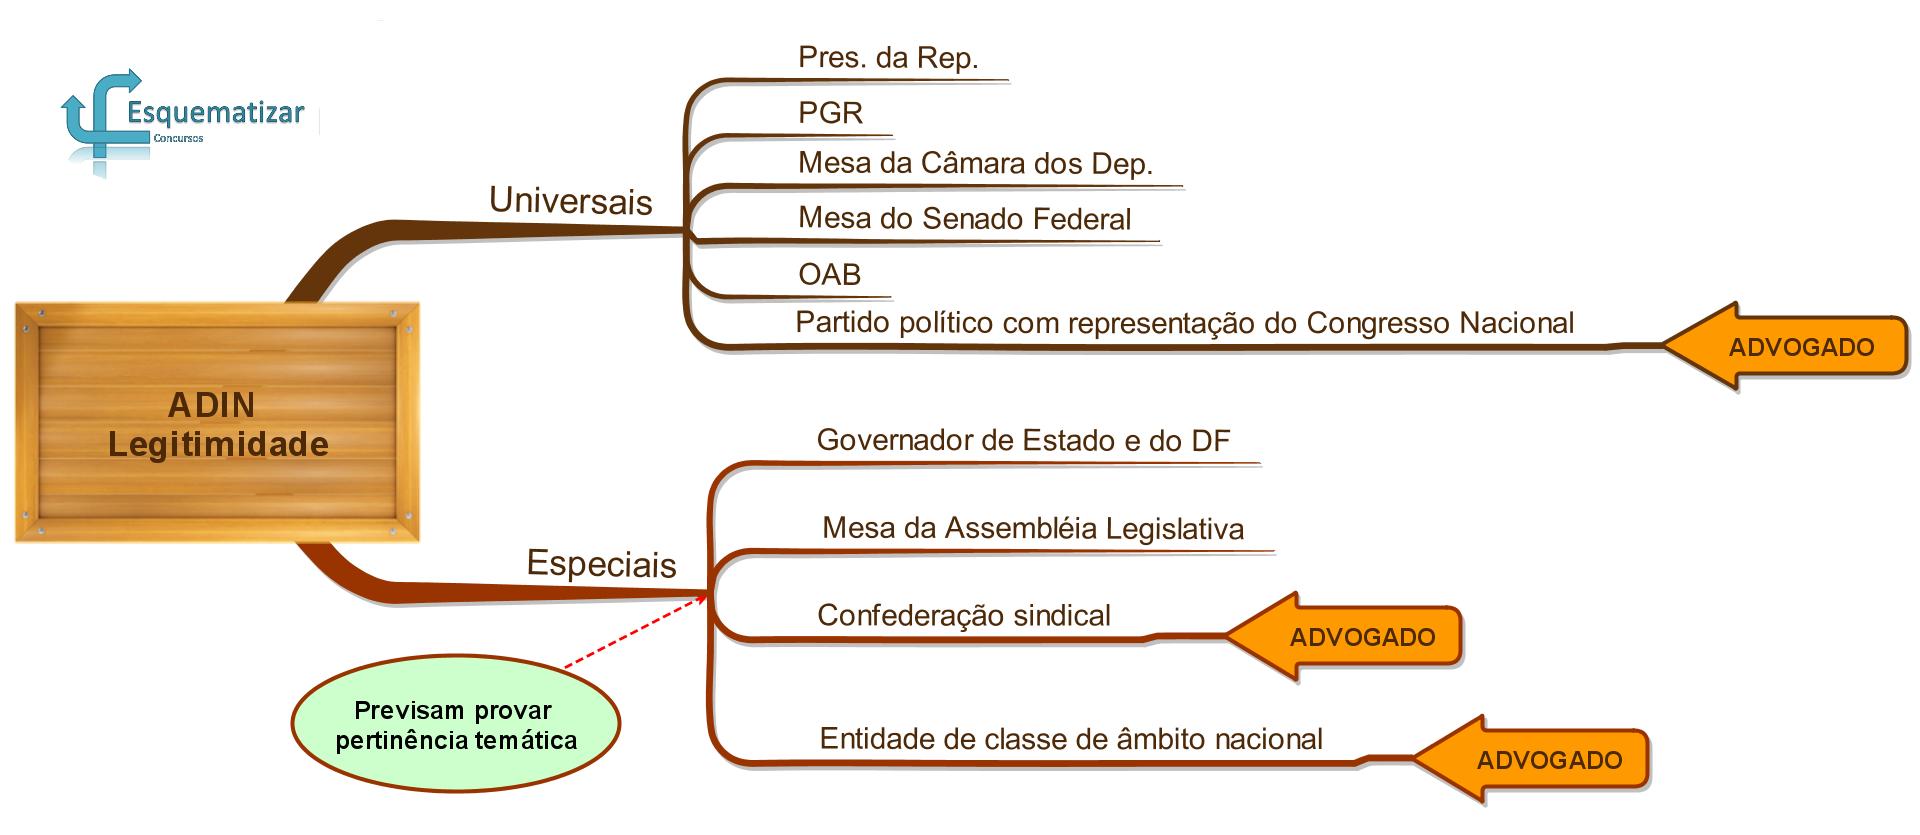 Controle concentrado de constitucionalidade